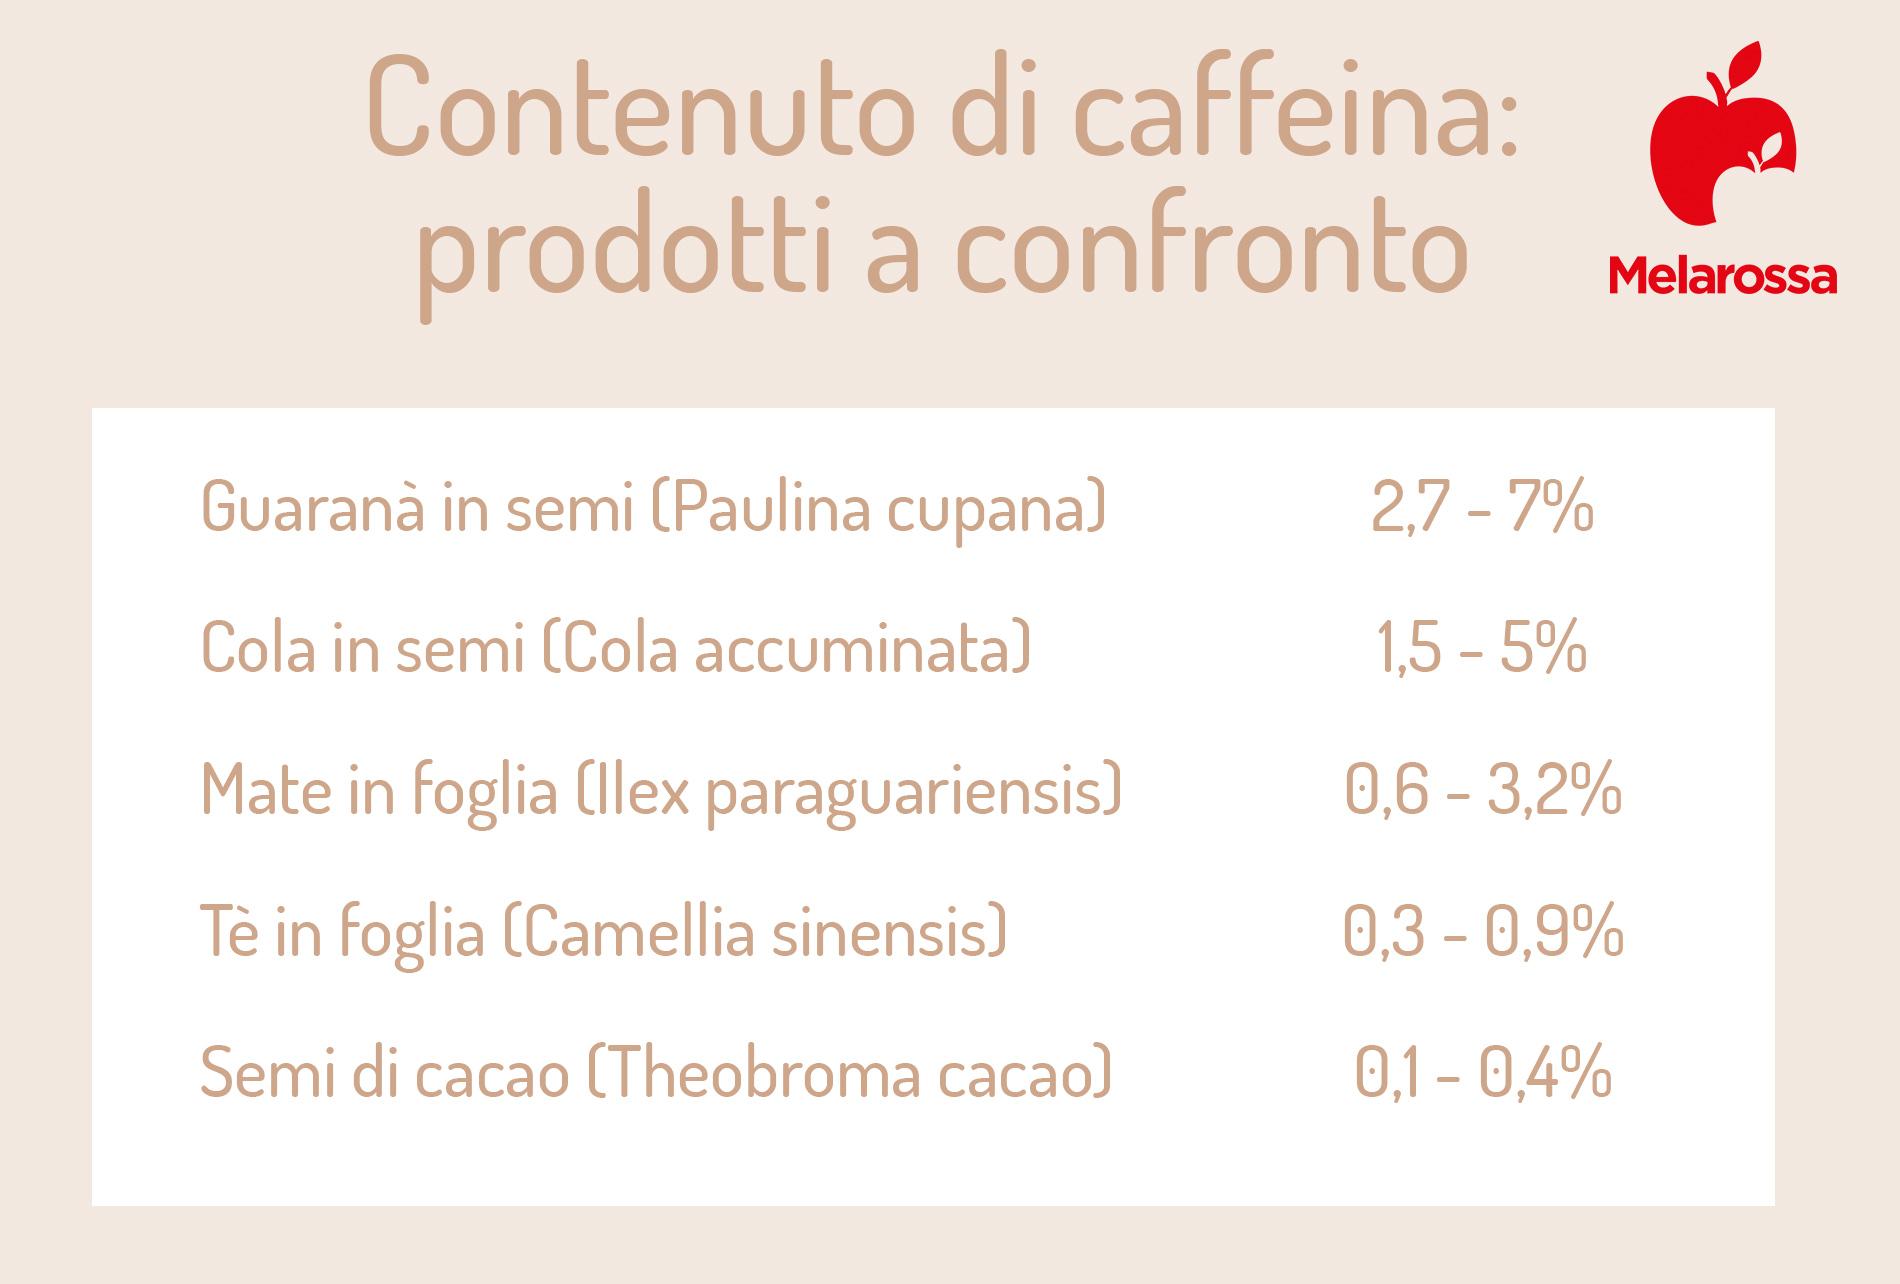 yerba mate: contenuto caffeina